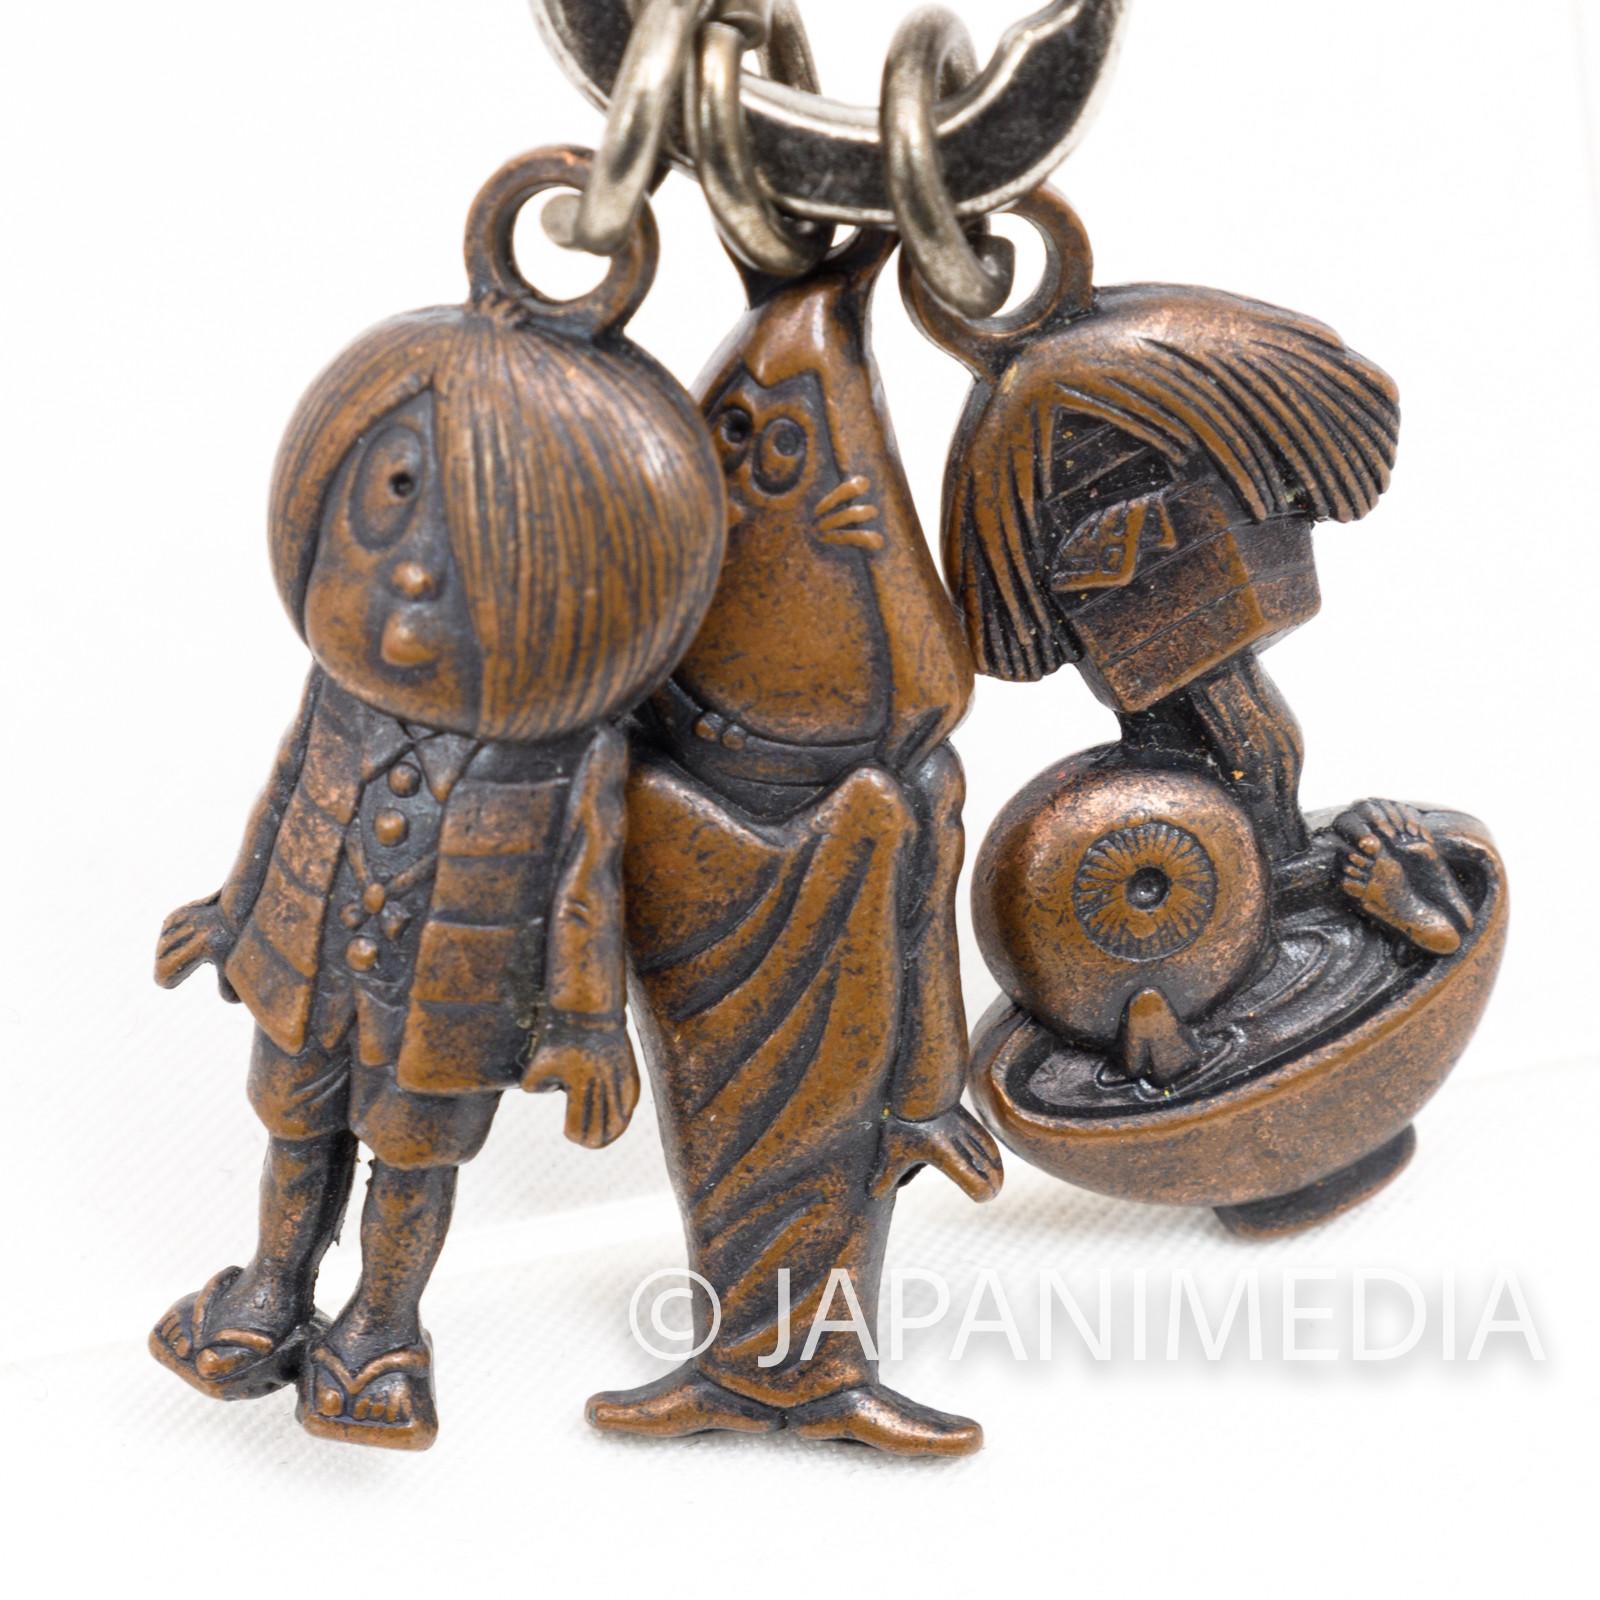 Gegege no Kitaro Medama Oyaji Nezumi Otoko Metal Mascot Keychain JAPAN YOKAI